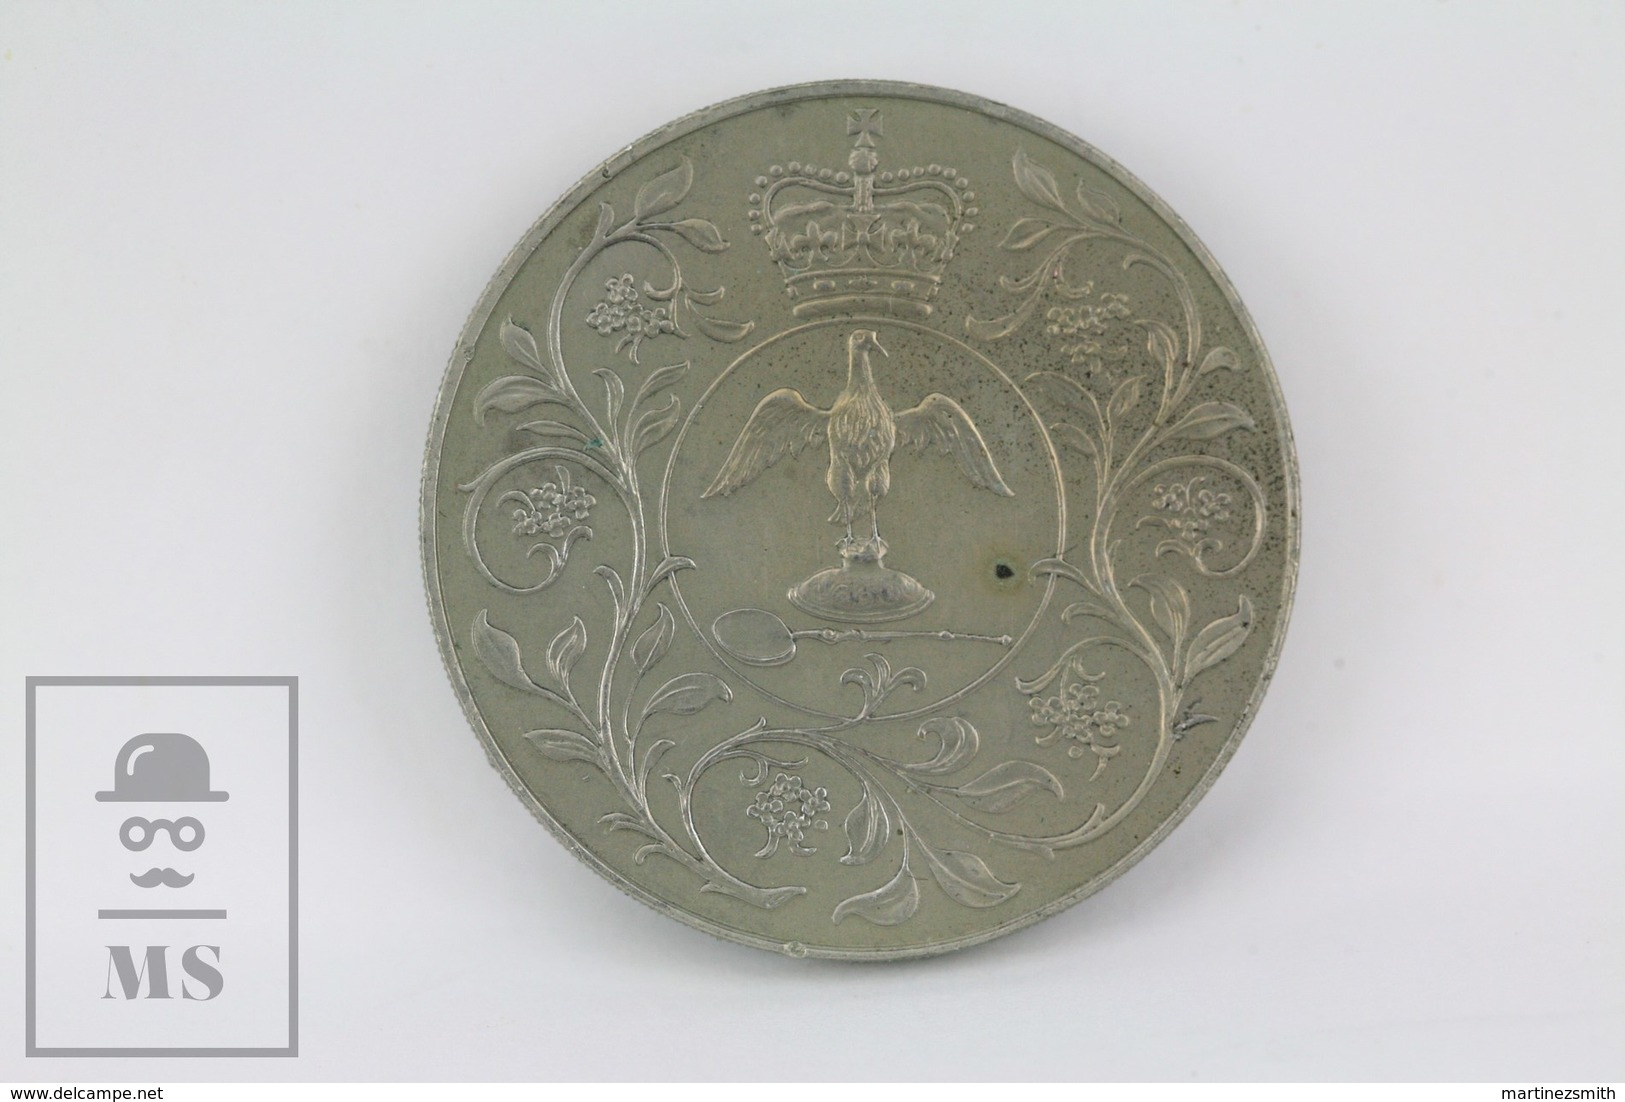 Vintage British 1977 Elizabeth II Silver Jubilee Crown Coin DG. REG. FD - Adel